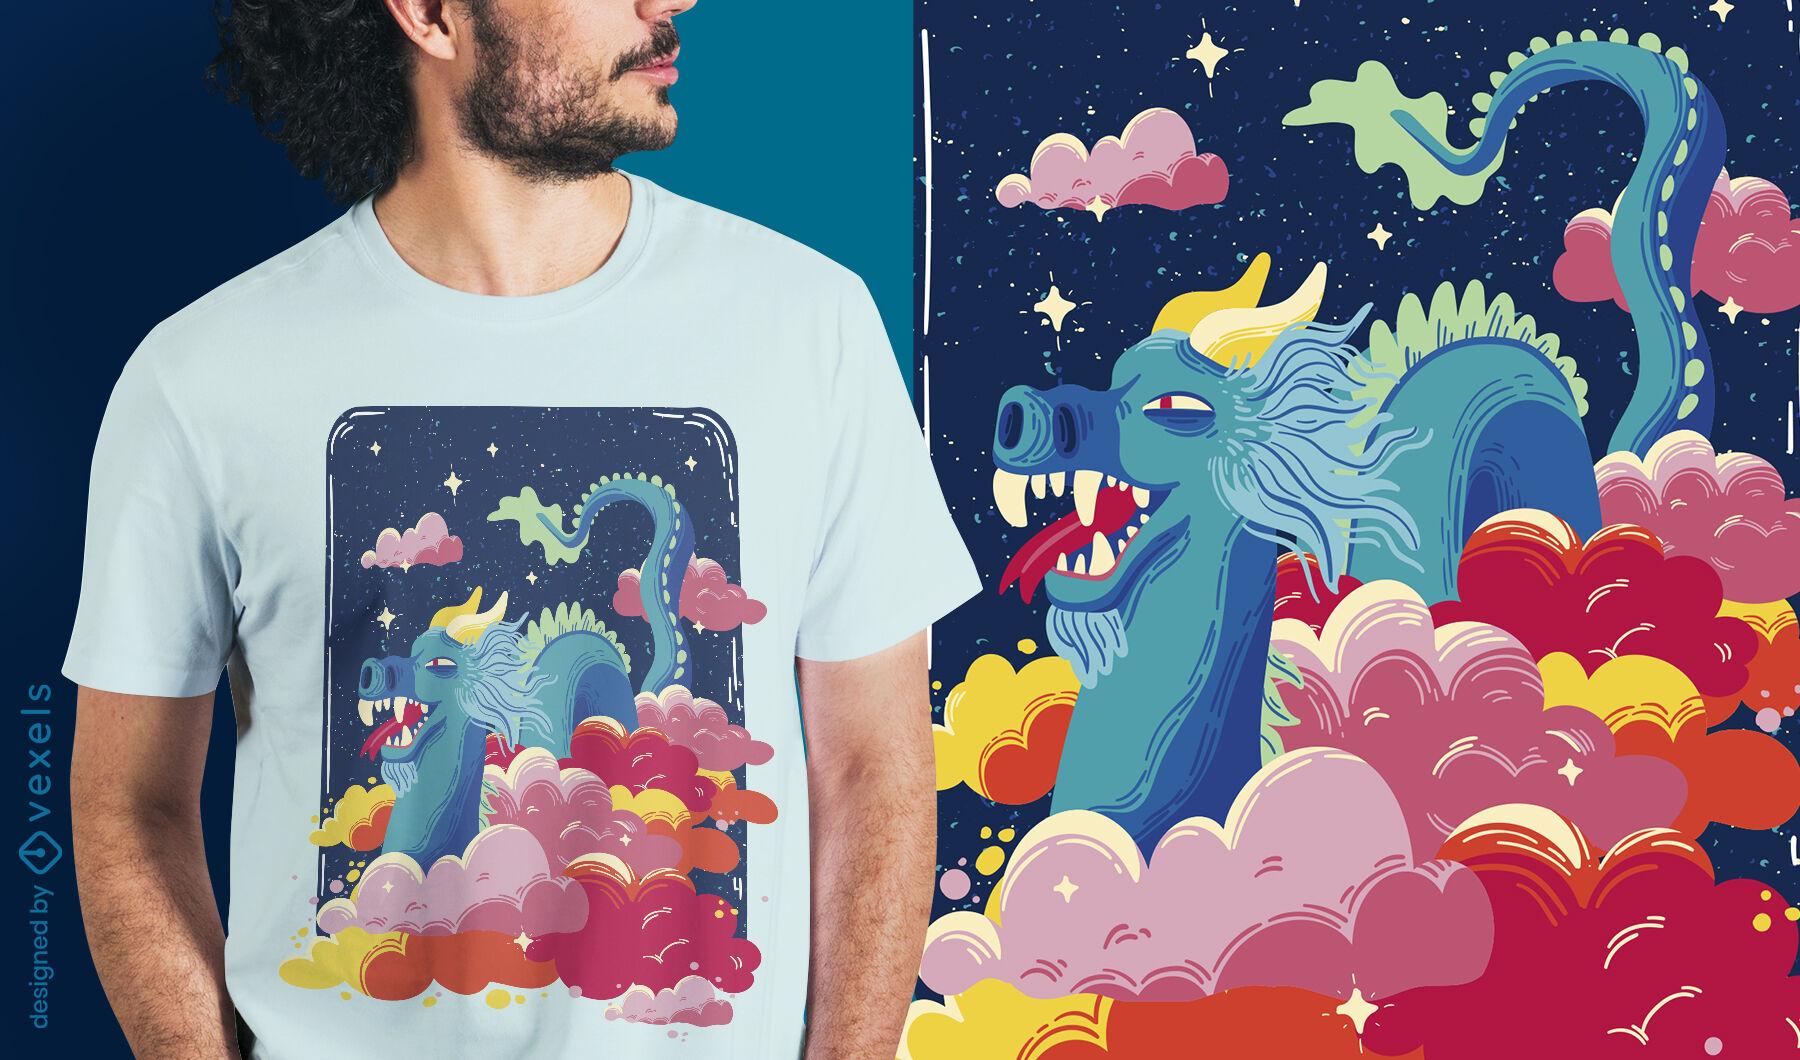 Cool dragon in the clouds diseño de camiseta